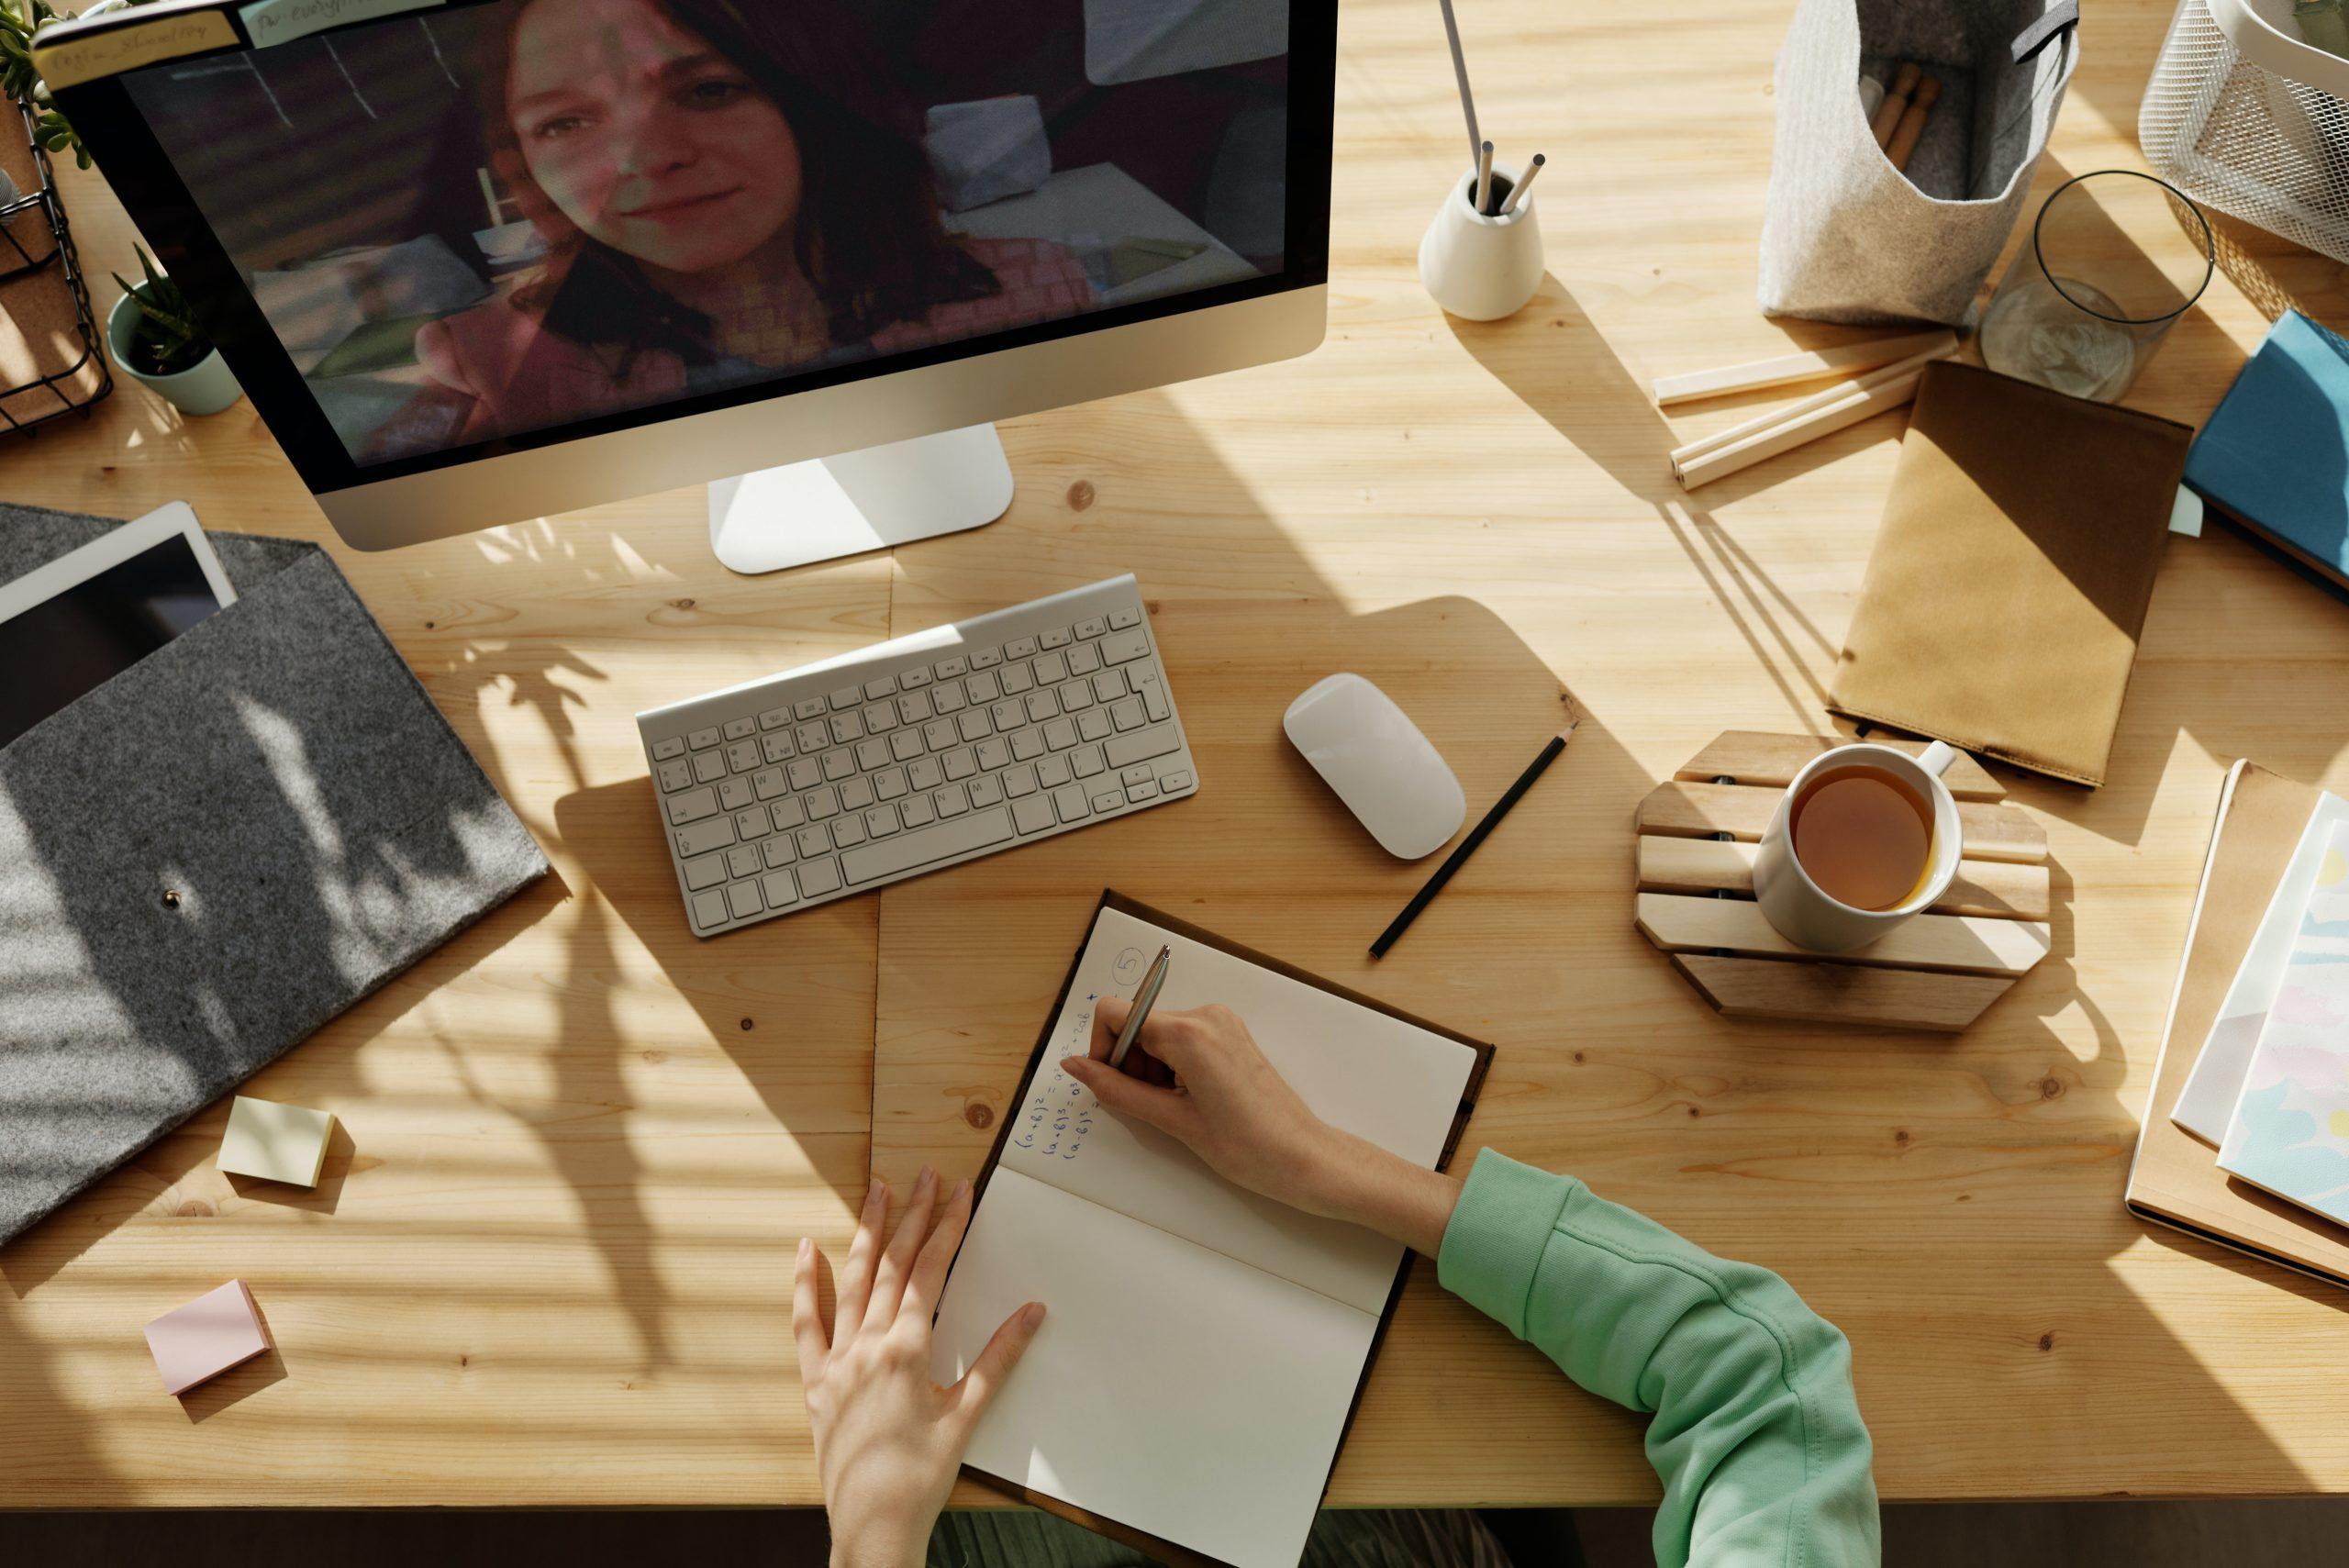 Belangenclubs: tweede digitale AvA moet beter